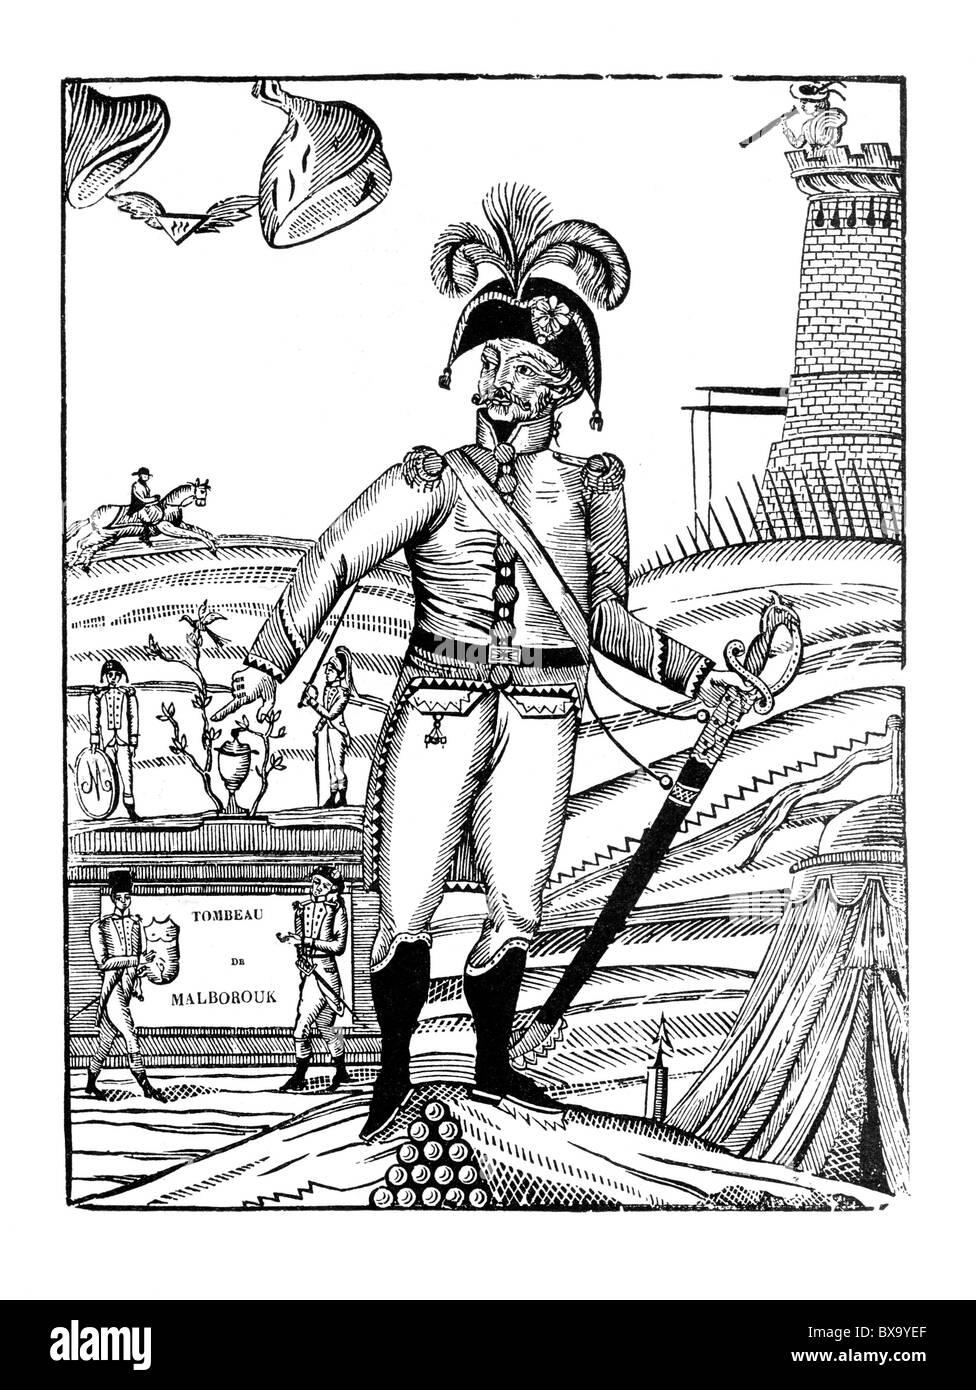 Malborouk, a French Satire on the death of John Churchill, 1st Duke of Marlborough; Black and White Illustration; - Stock Image